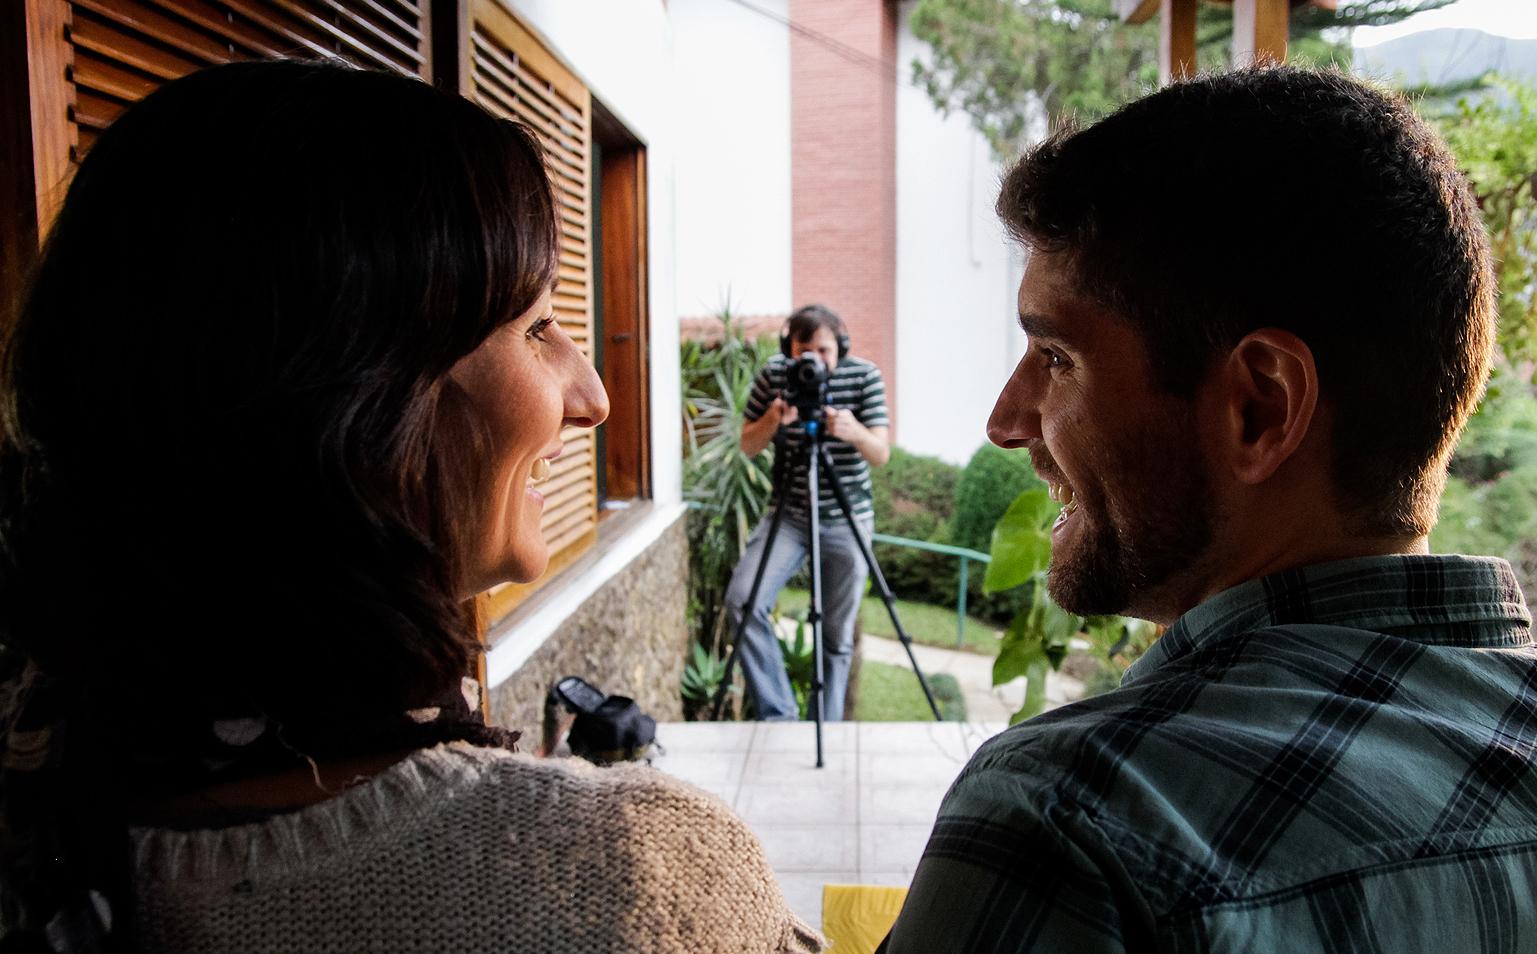 Luz, câmera, segura a timidez, solta o verbo! - Foto: Carol Lá Lach